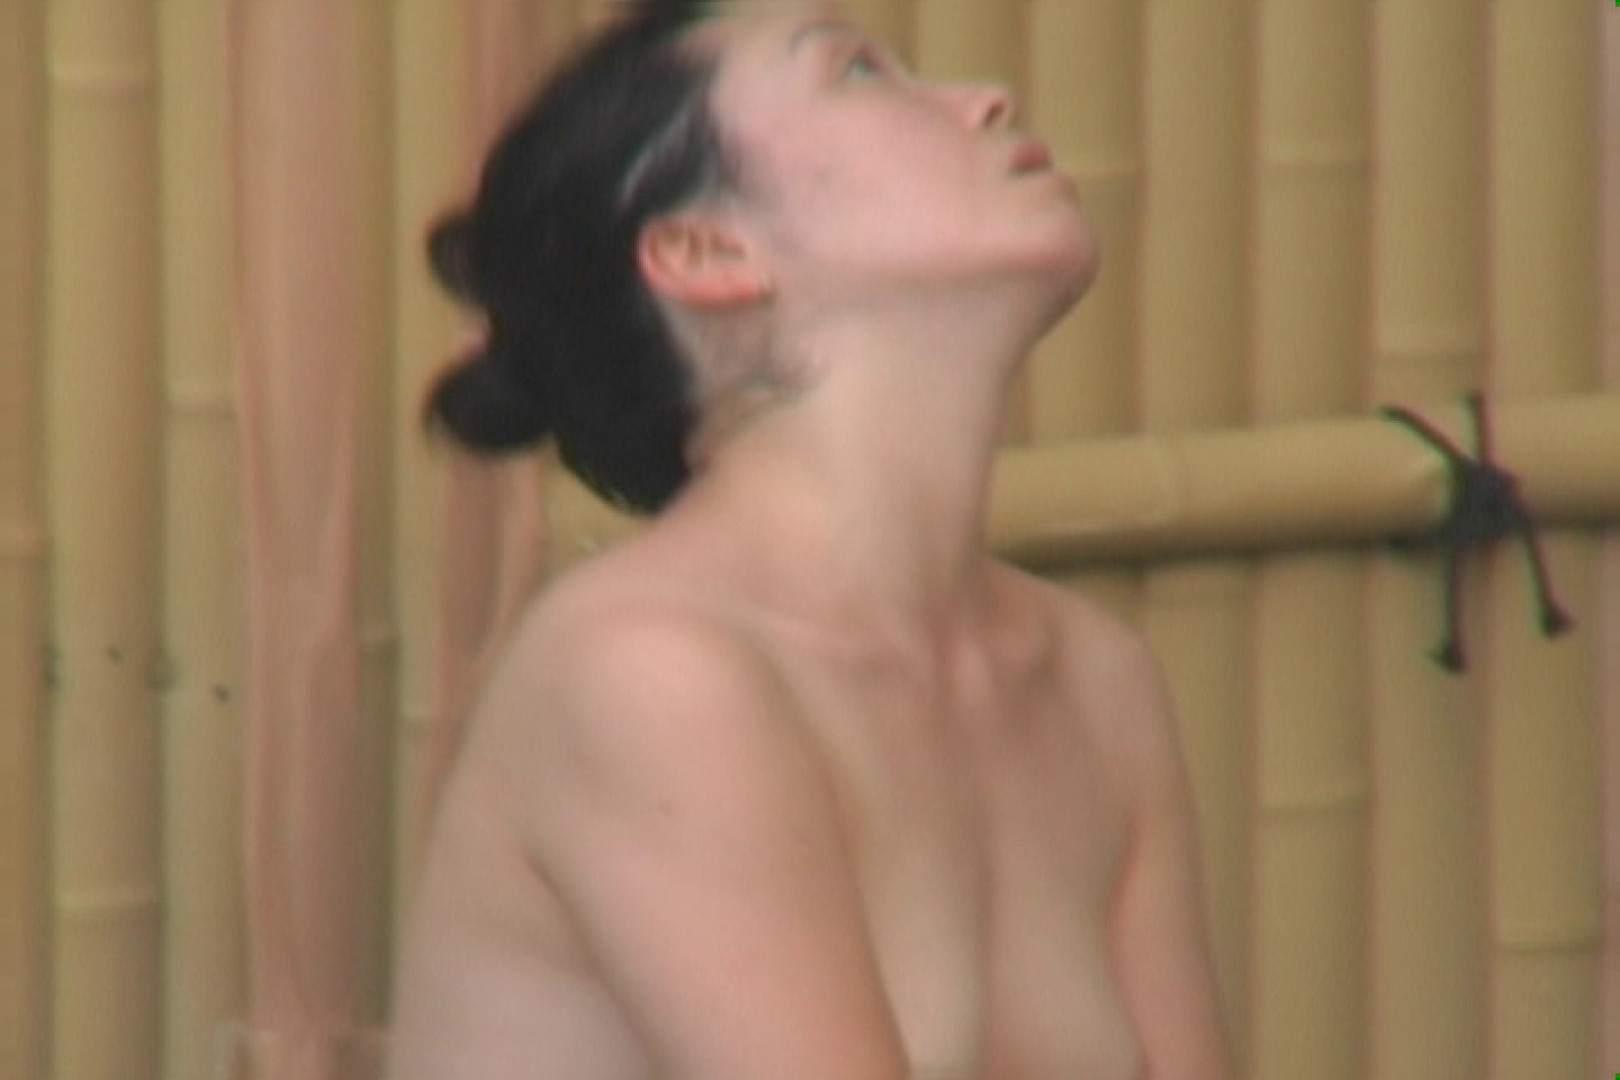 Aquaな露天風呂Vol.577 露天風呂突入   盗撮師作品  101pic 4